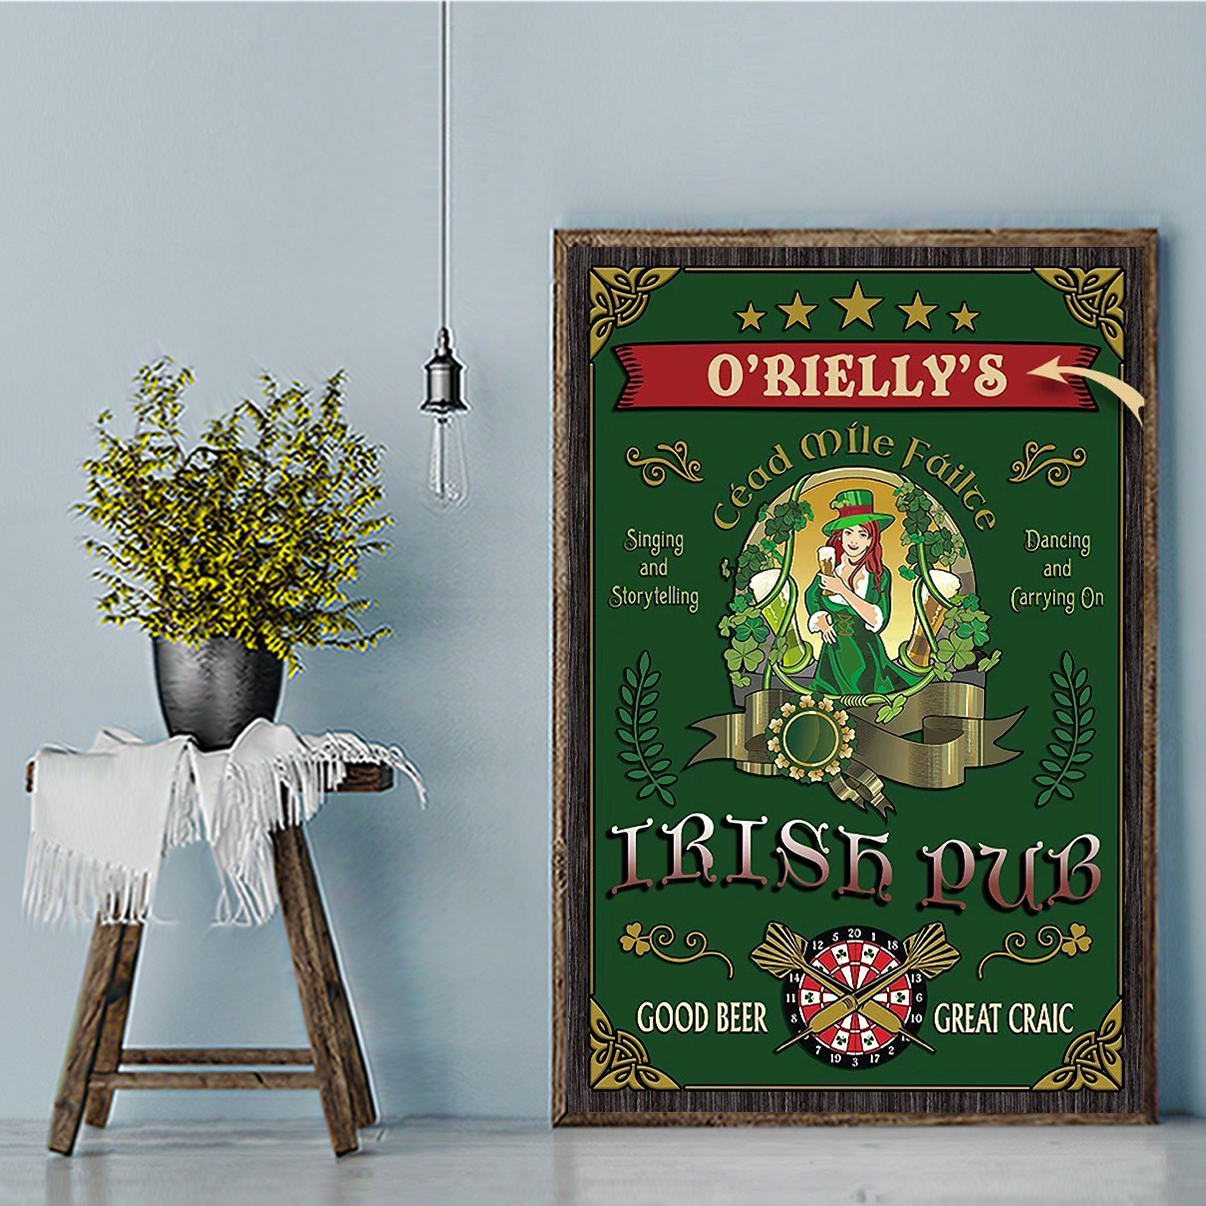 Personalized custom name beer girl Irish pub good beer great craic poster A3